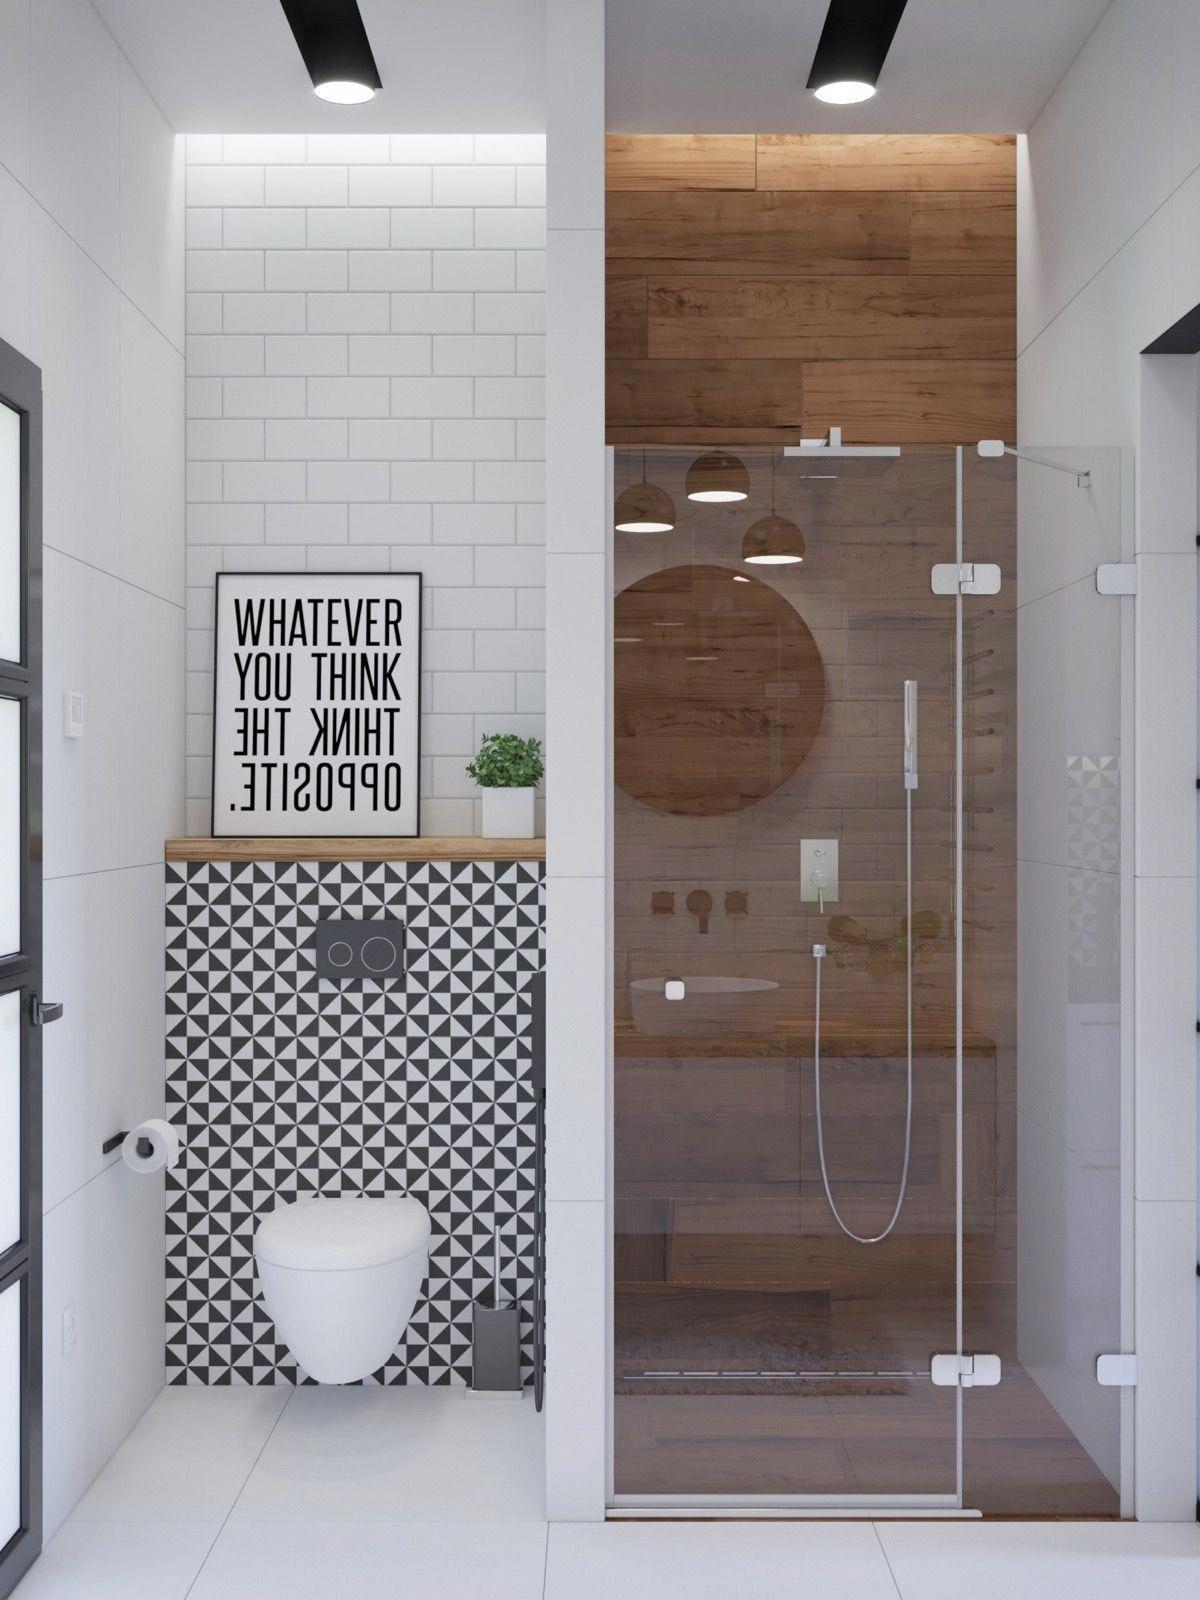 Toilet Wall Art Nz